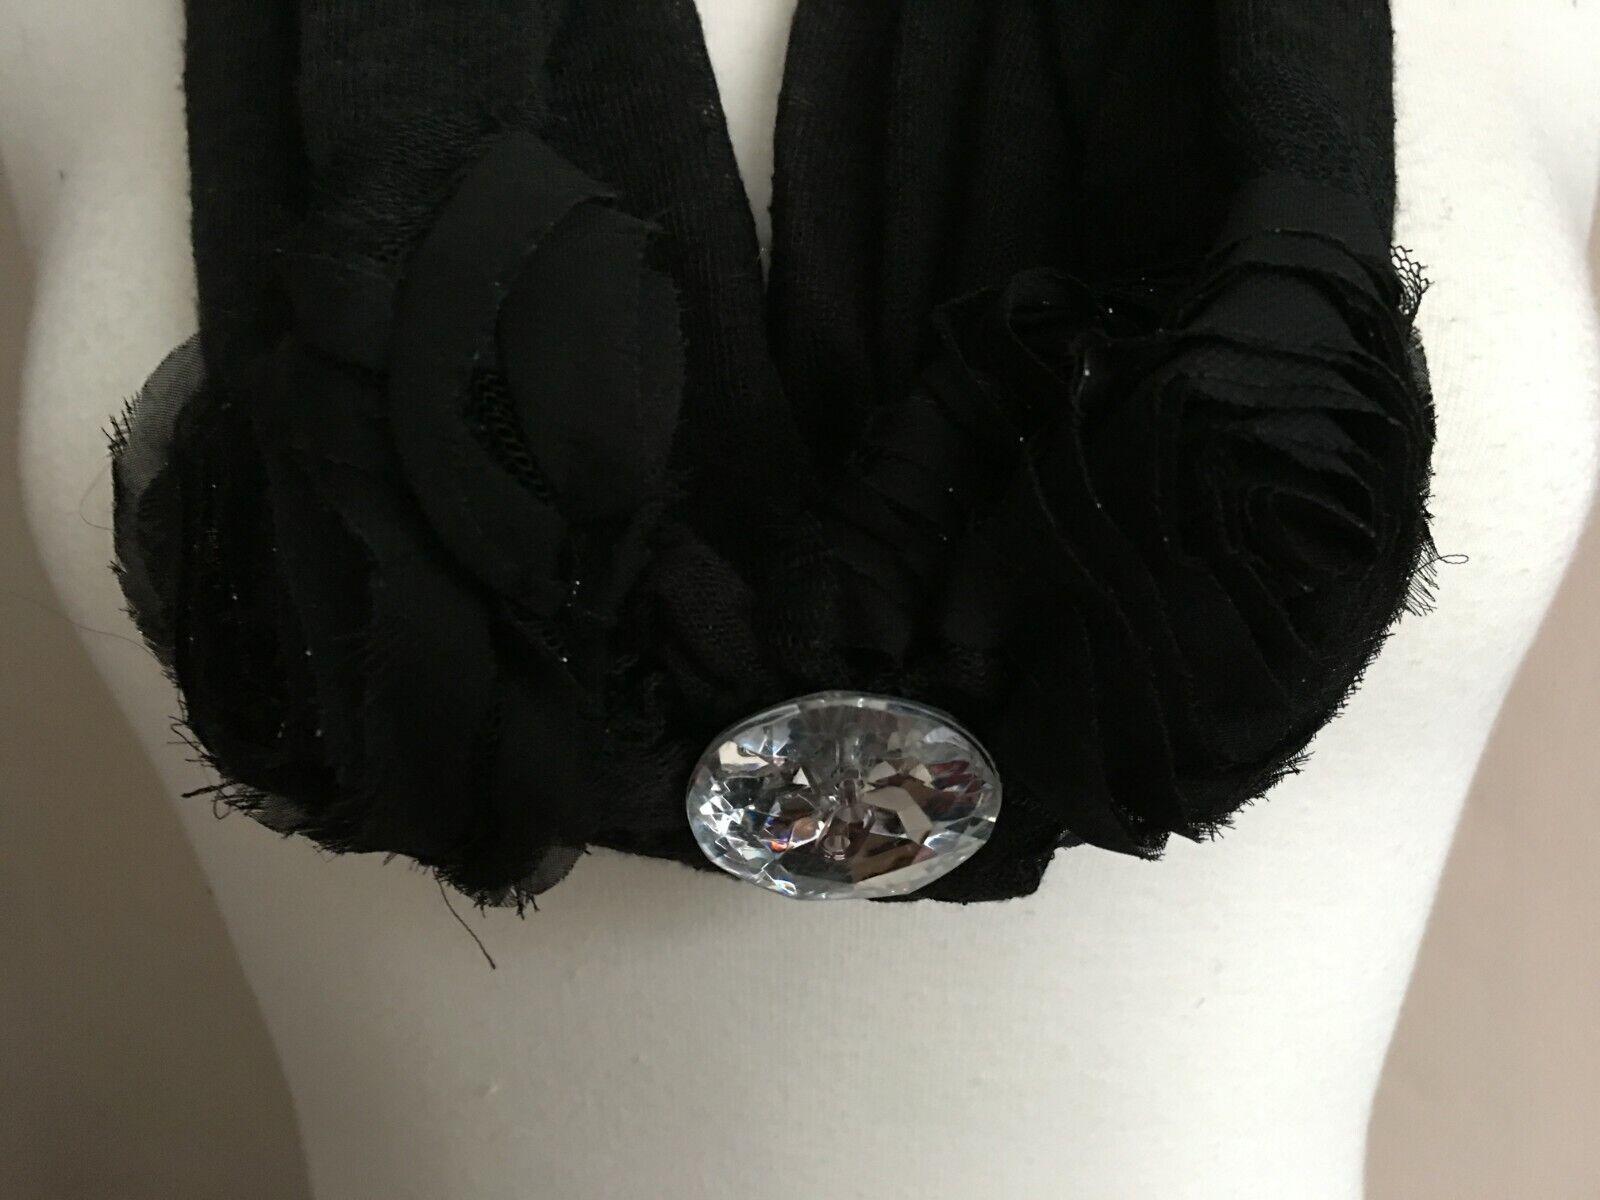 Girls/Women's Black Cowl Neck Type fashion Scarf with decorative glassy button